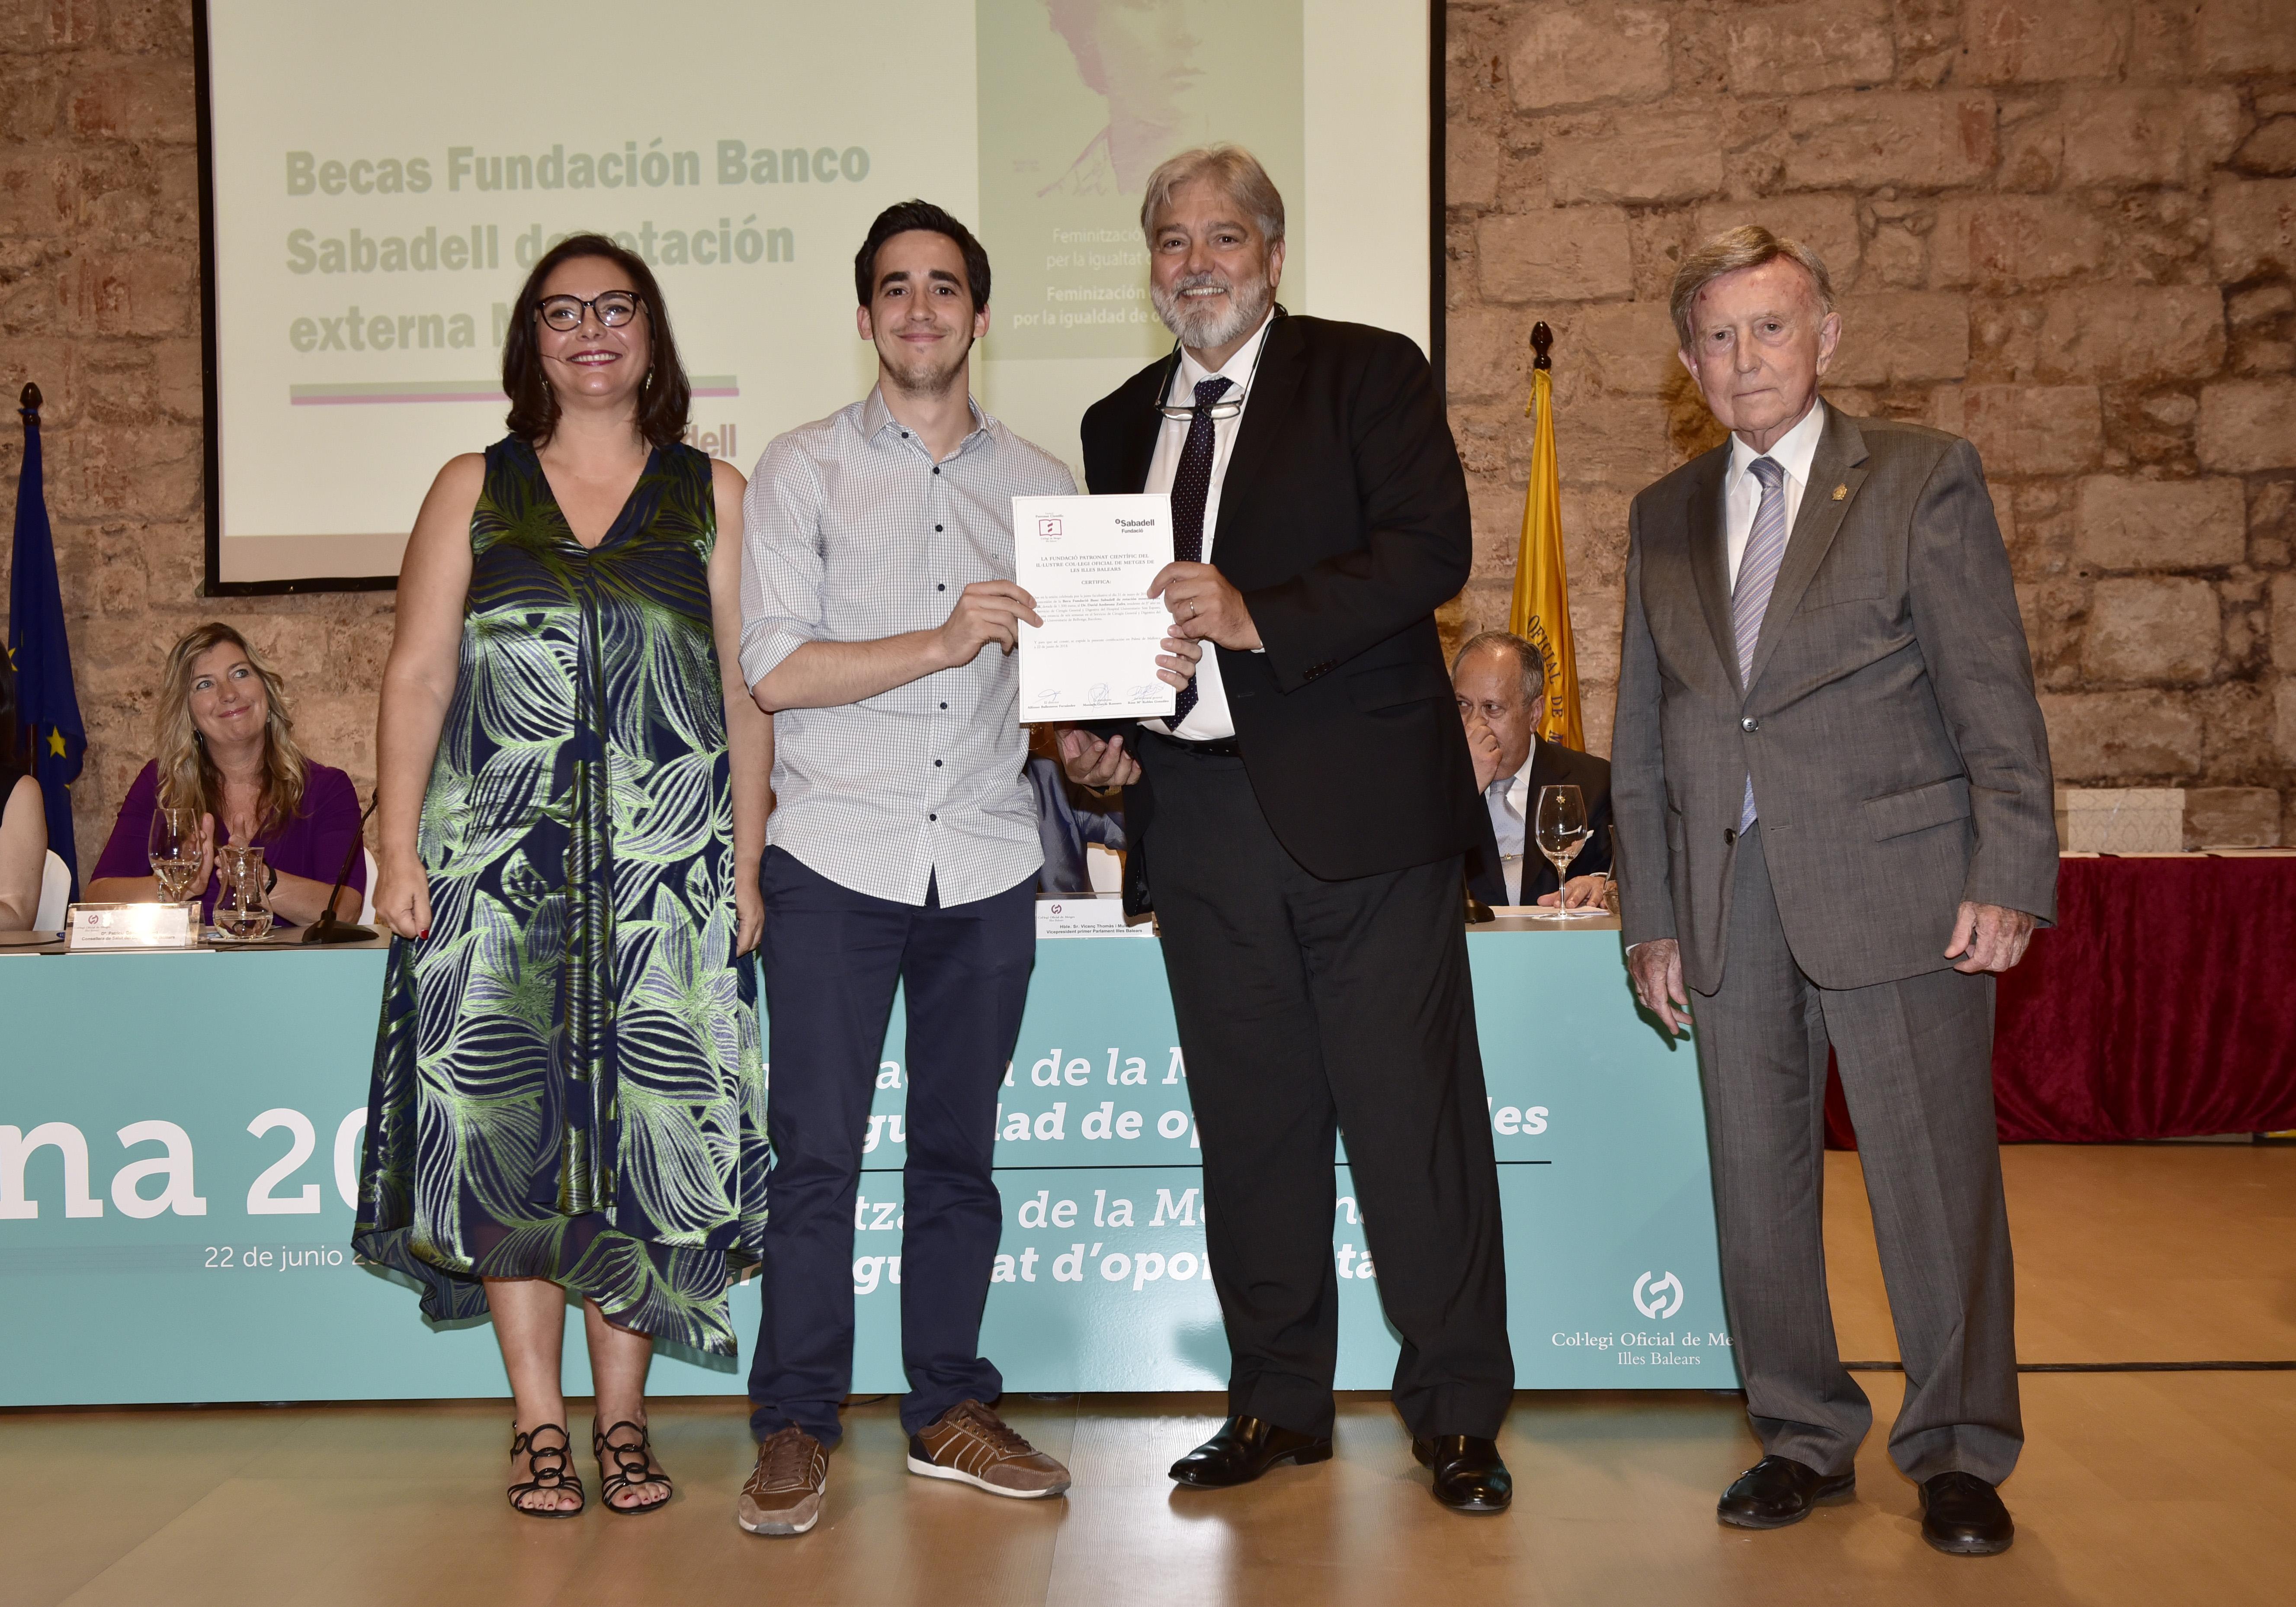 Beca Fundacio Banc Sabadell David Ambrona